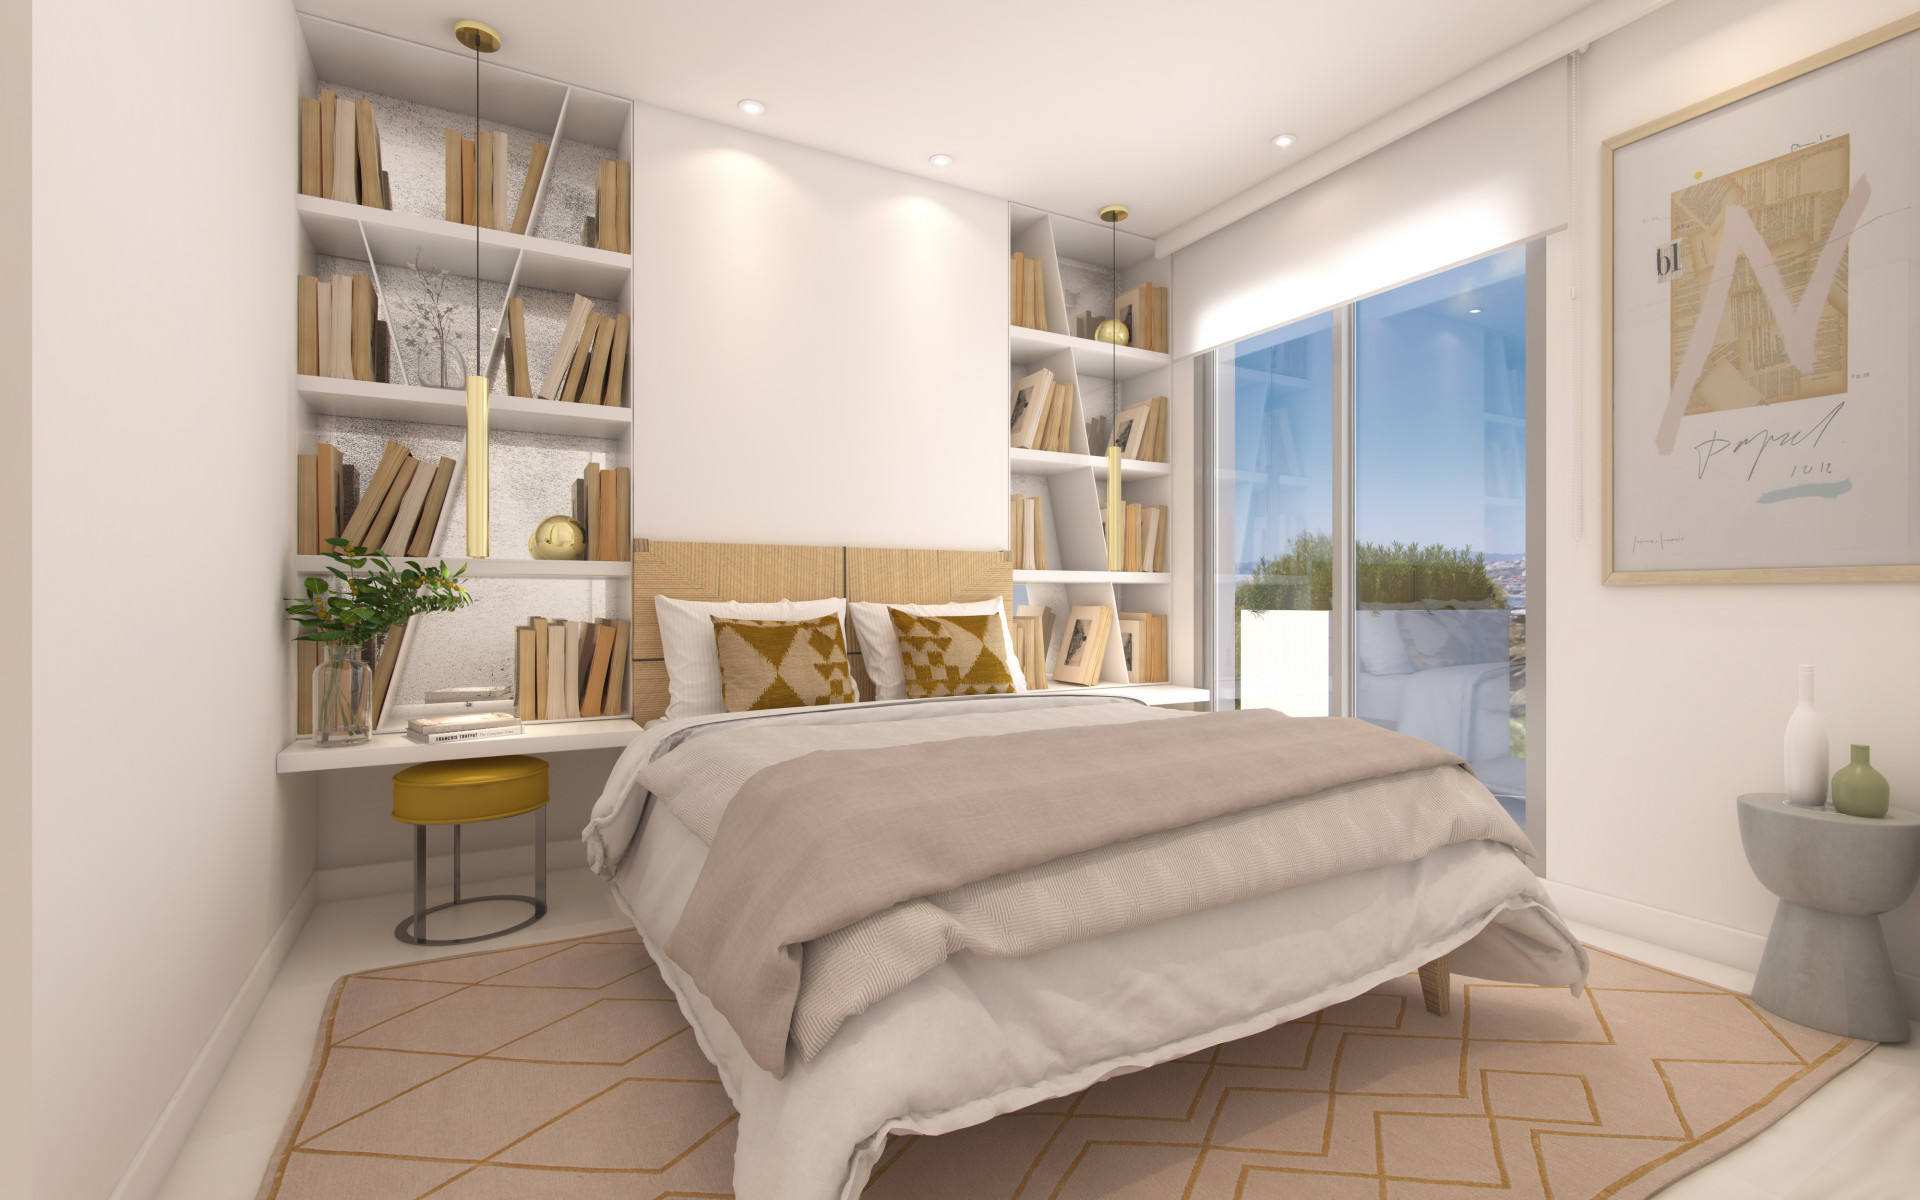 Apartment  for sale in  Torrequebrada, Benalmadena